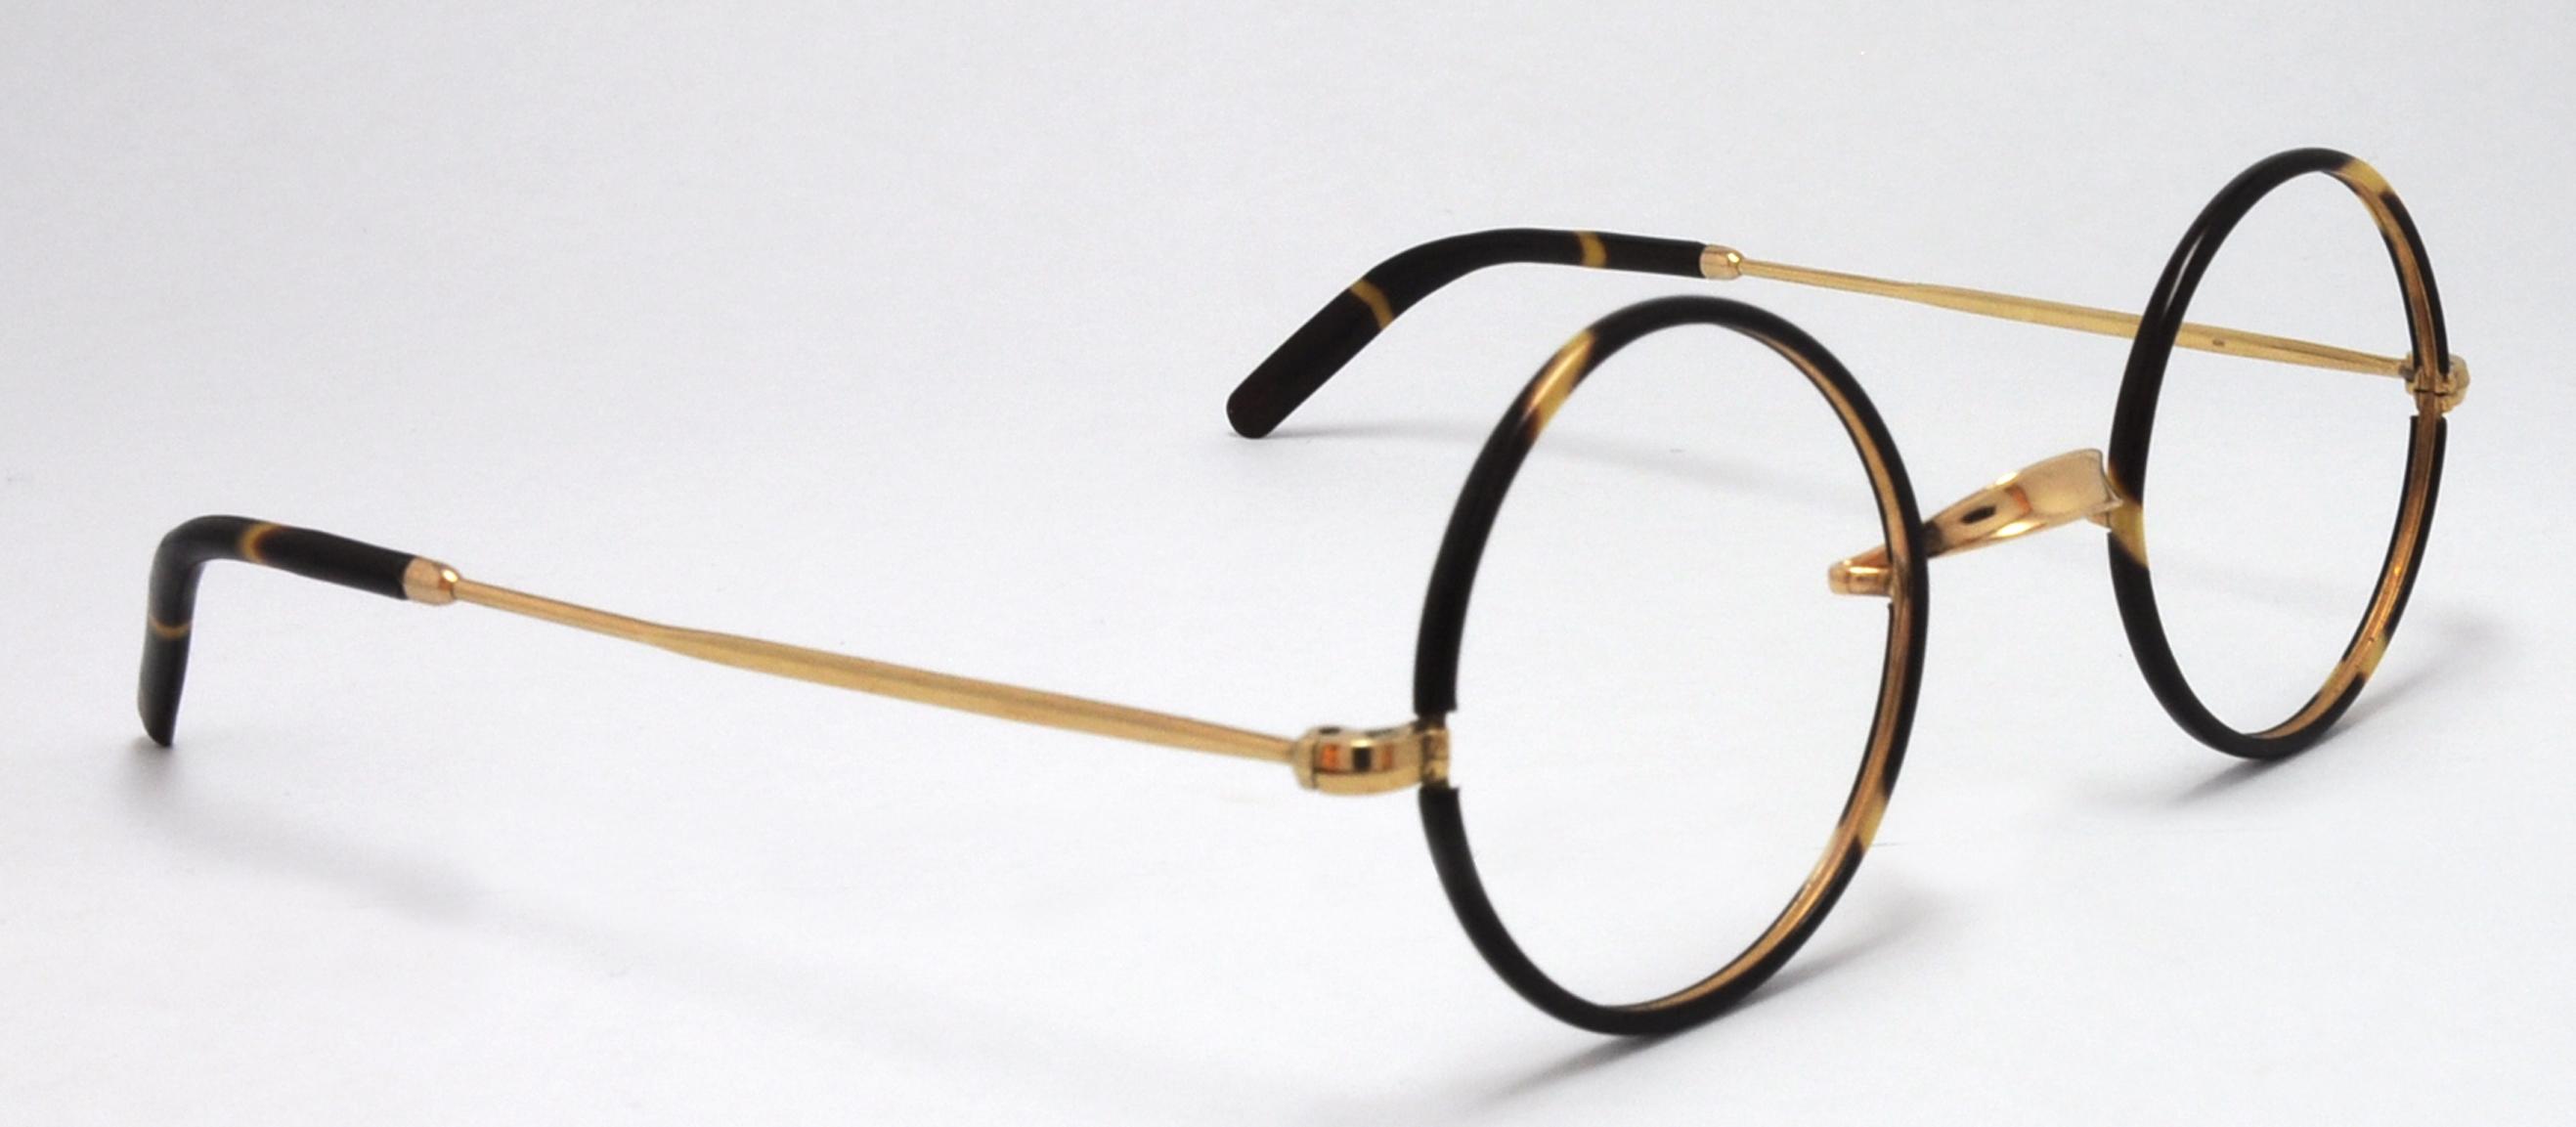 lunetist_-_lunettes_vintage_-_monture_charles_3_.jpg